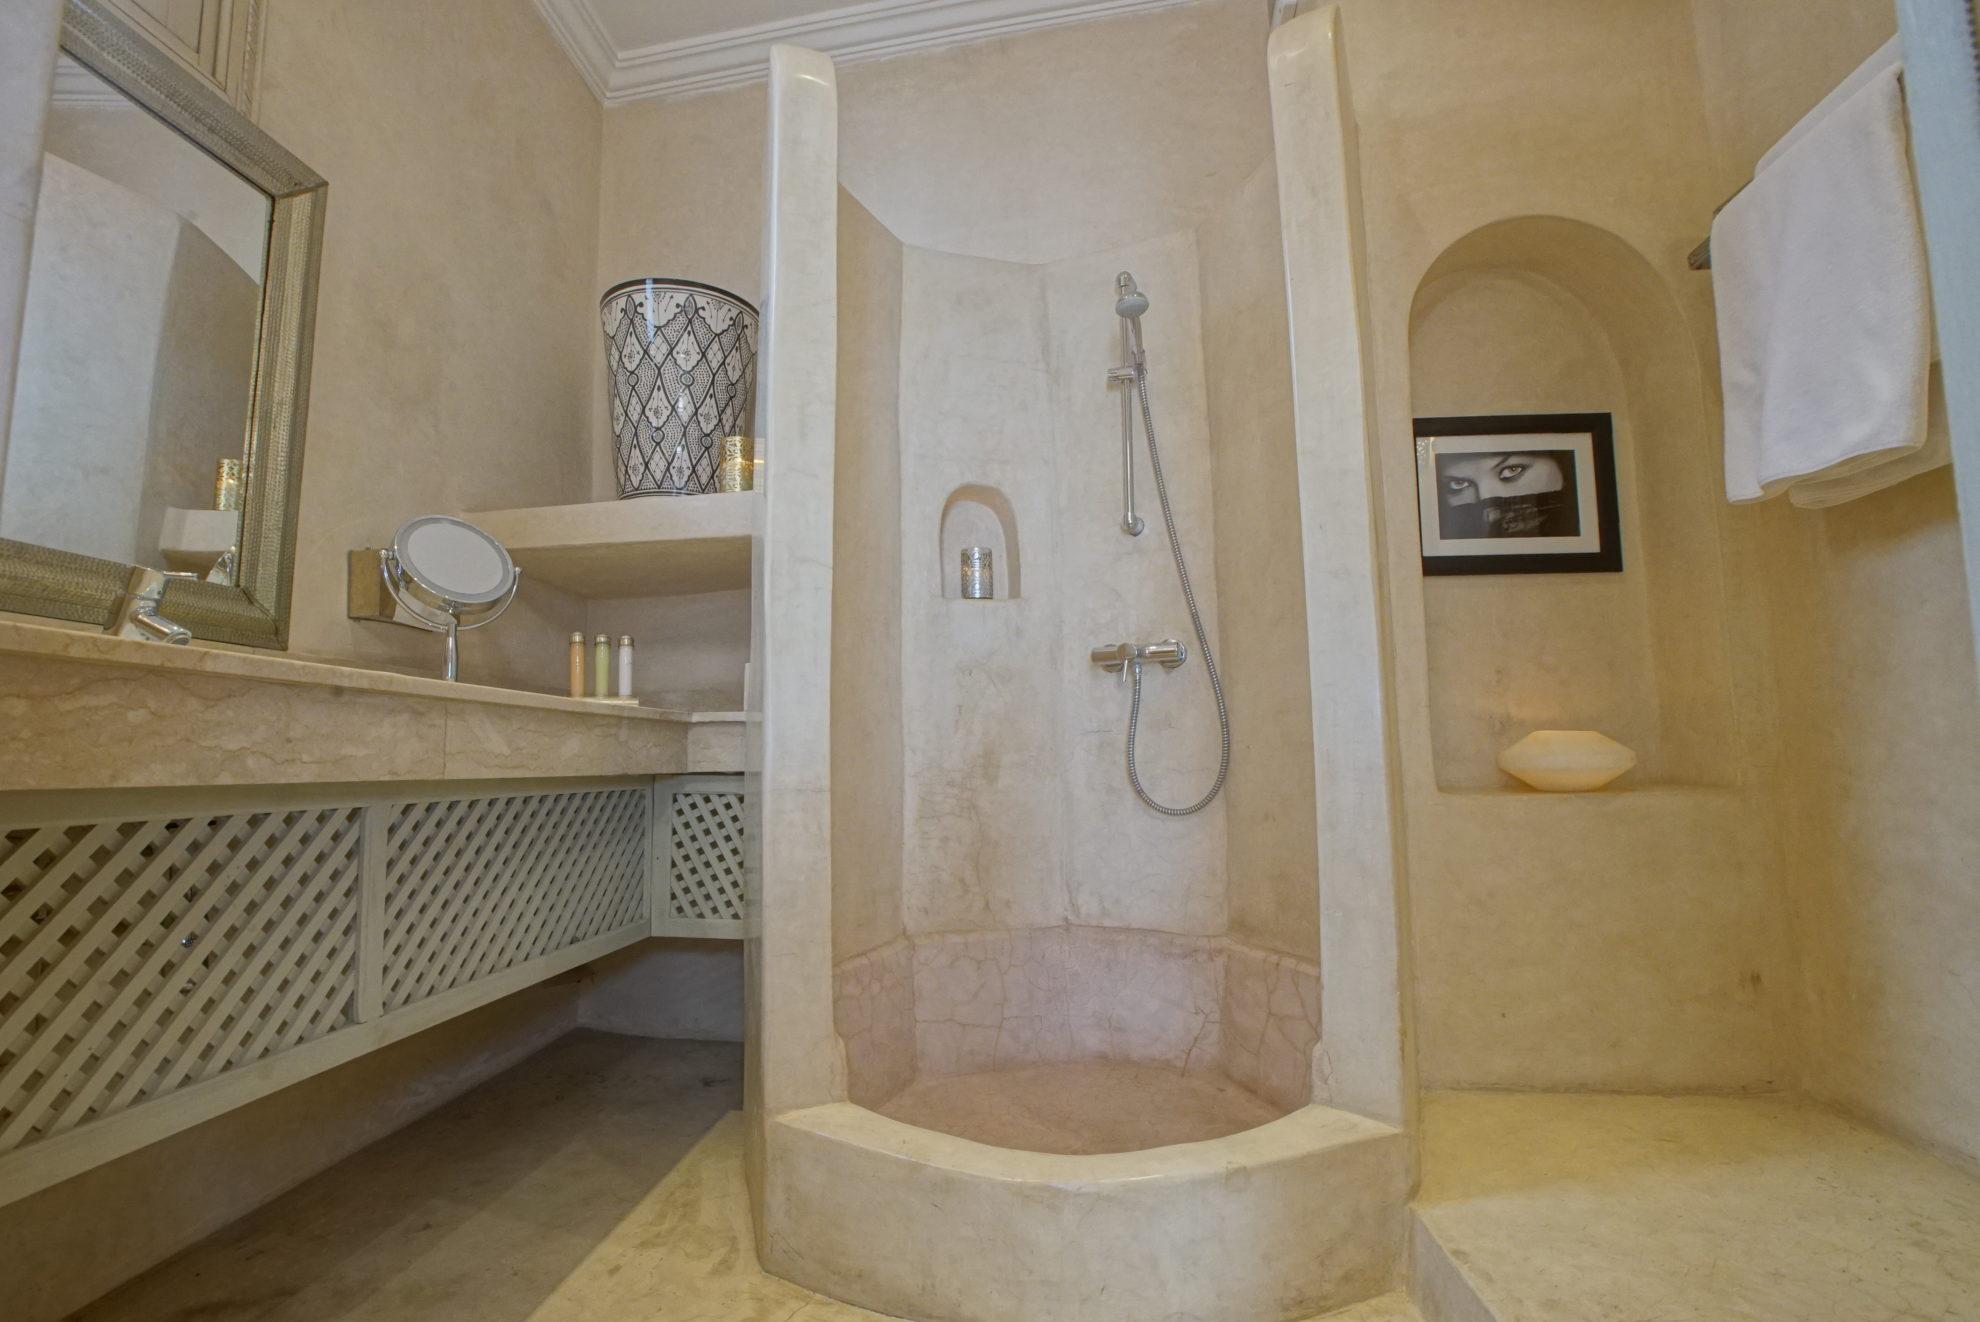 salle de bain dans la Médina de Marrakech